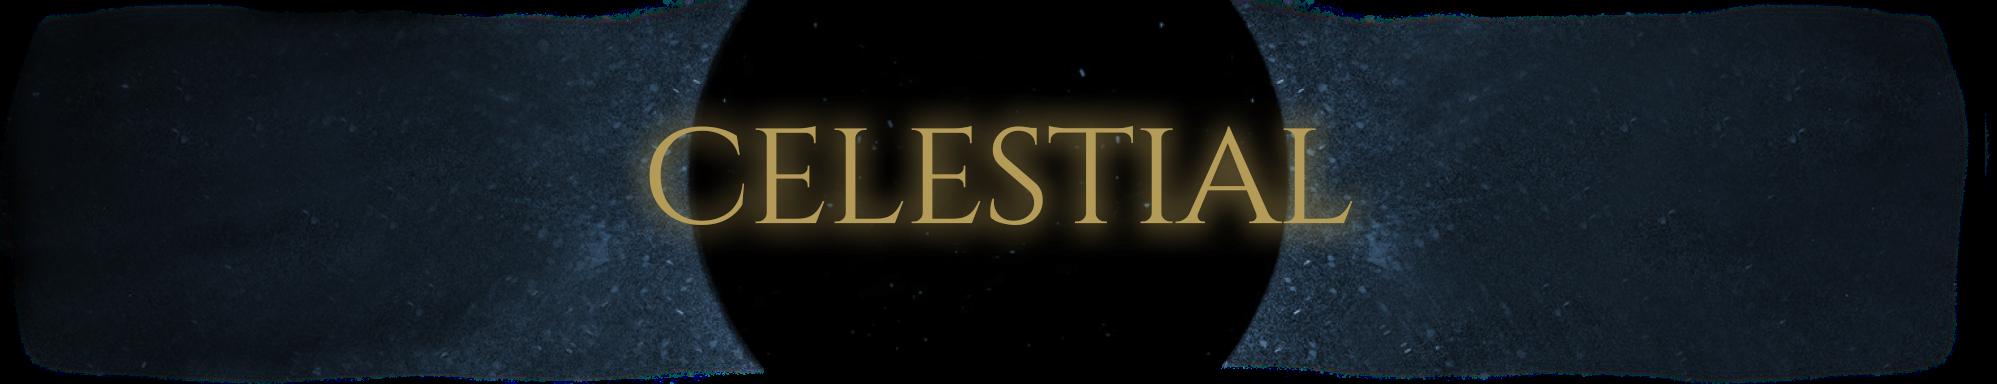 FRIDA. Celestial Collection. Banner.